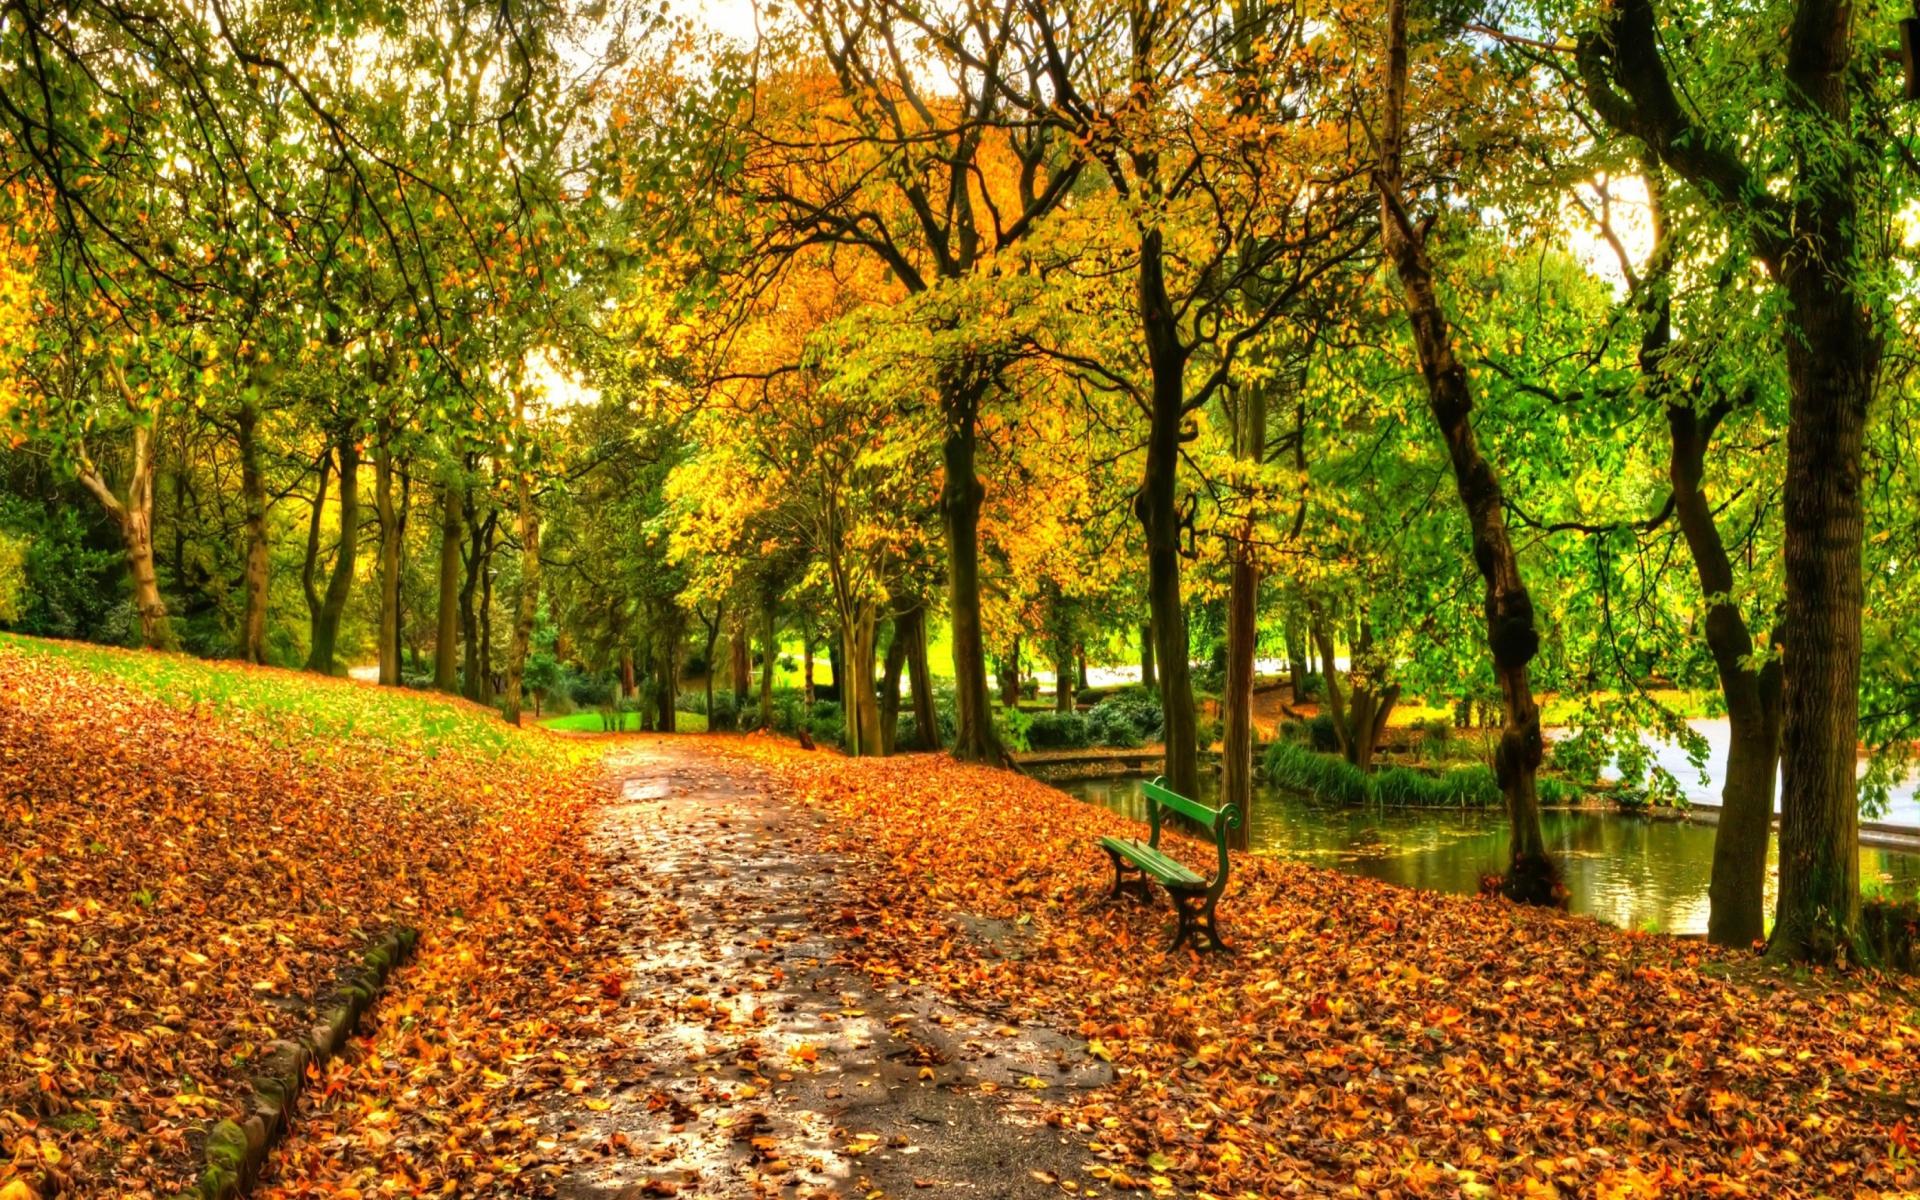 Central Park's Bow Bridge in Autumn HD Wallpaper ...  |Autumn Central Park Screensavers